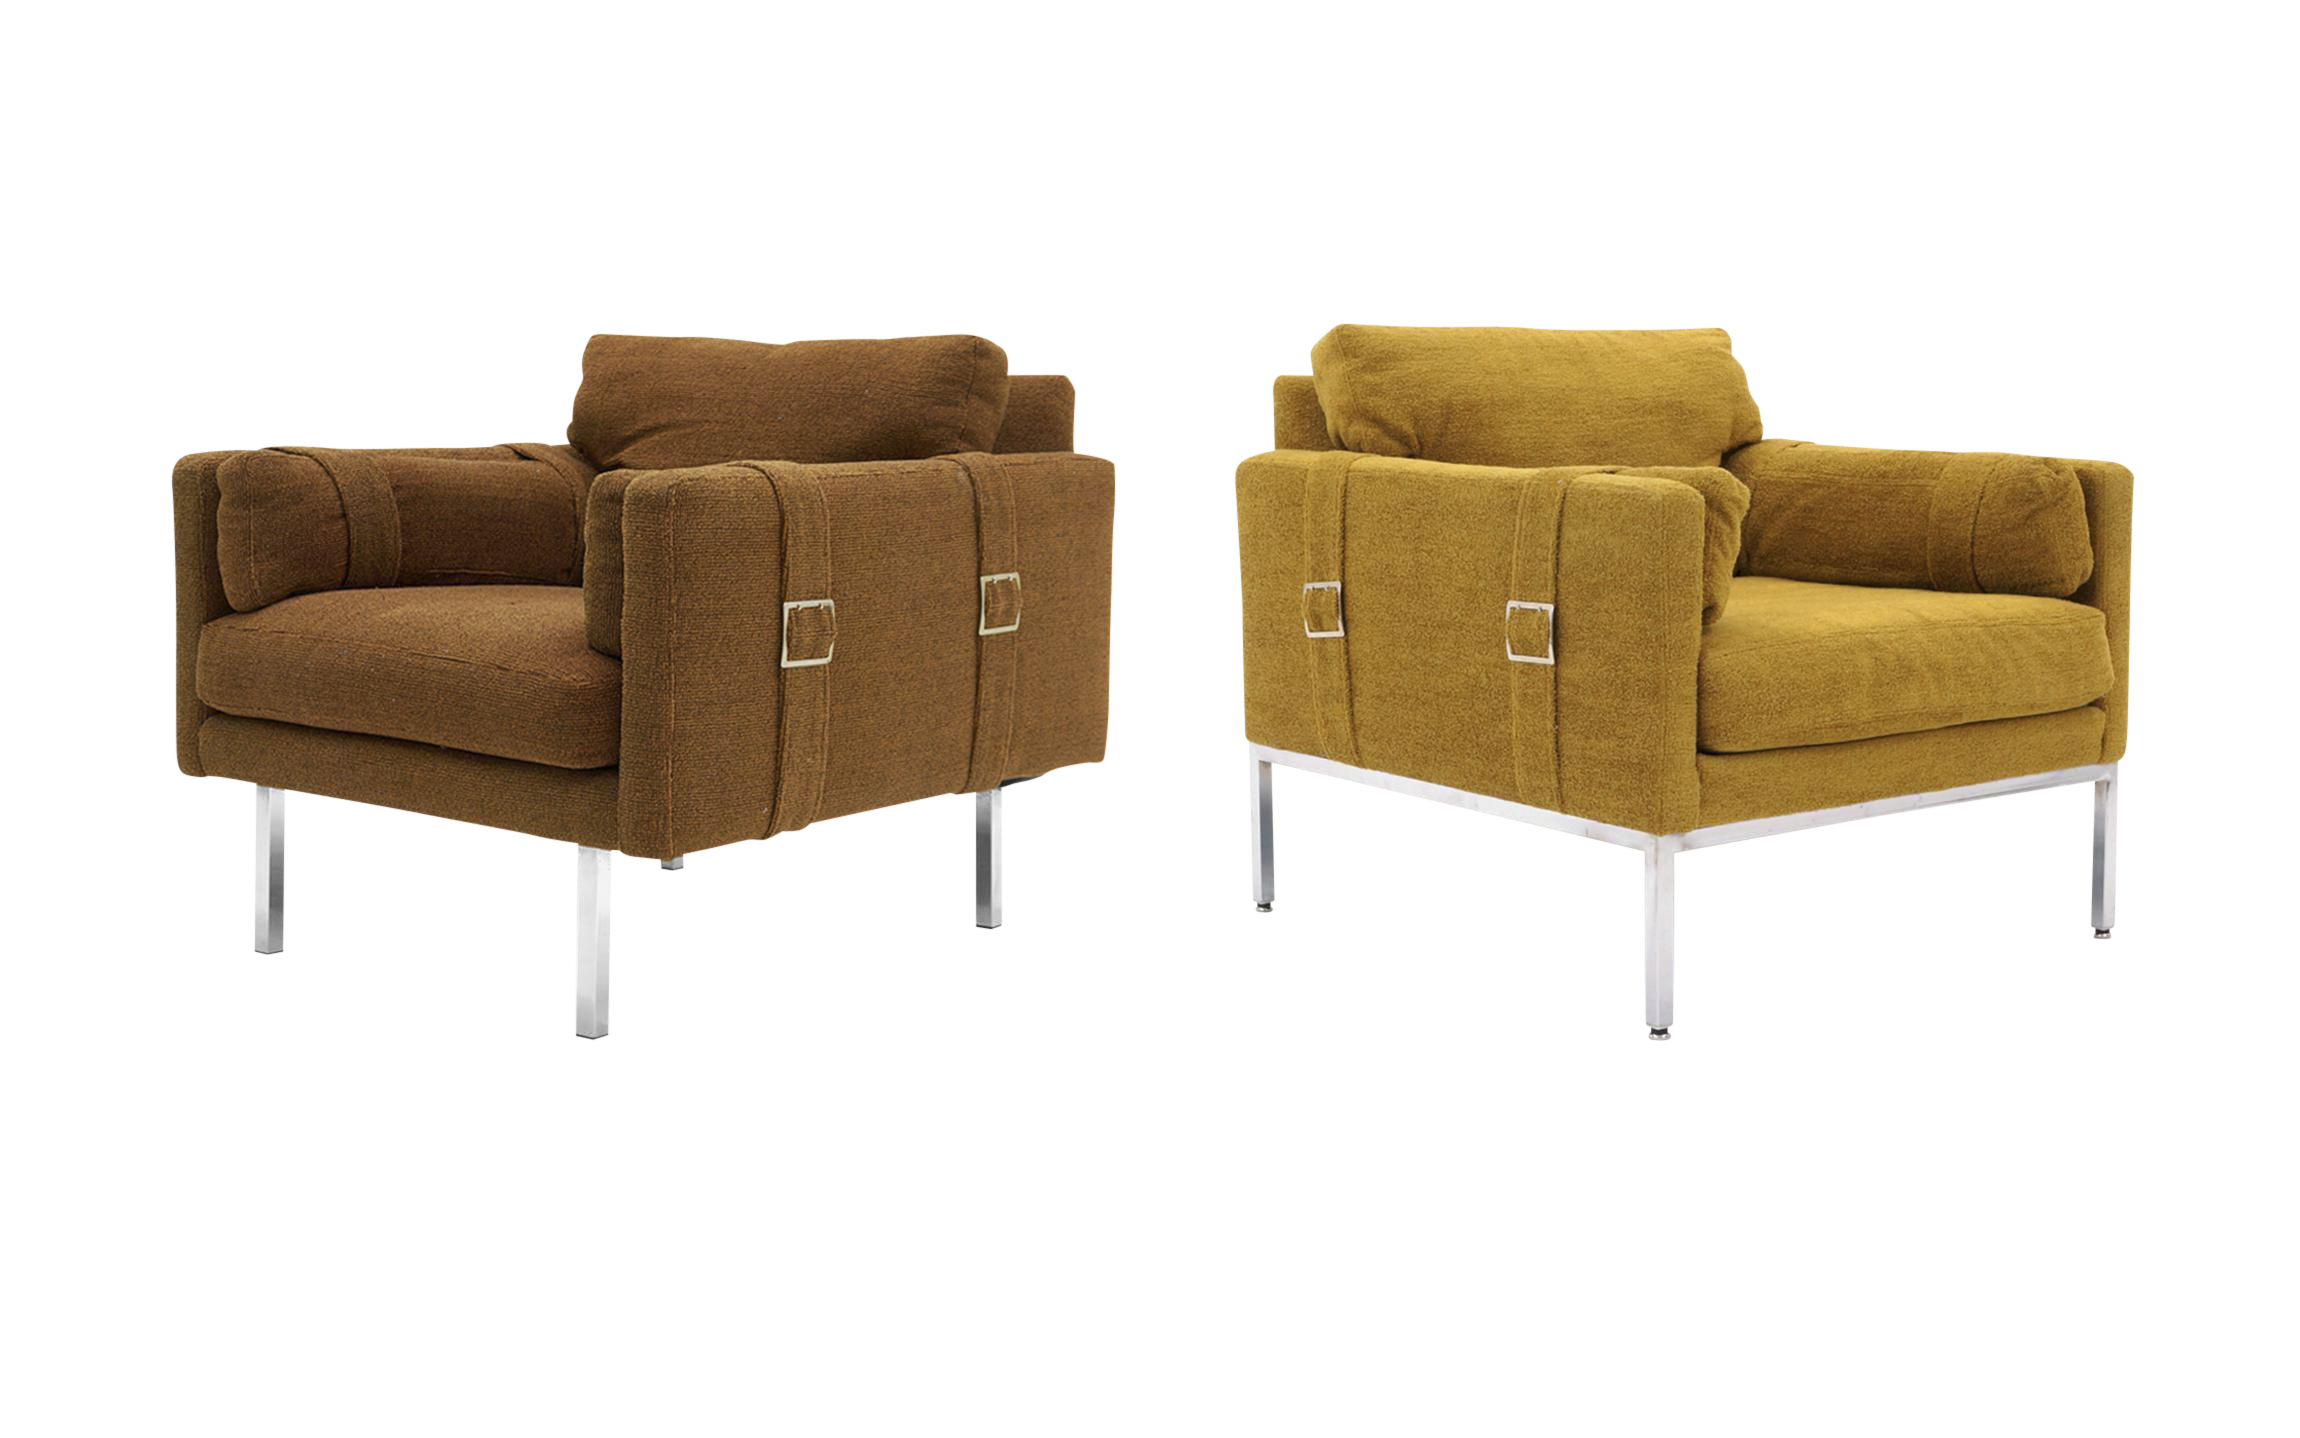 milo baughman furniture. Original Complimenting Pair Of Milo Baughman Lounge Chairs - Image 1 10 Furniture H